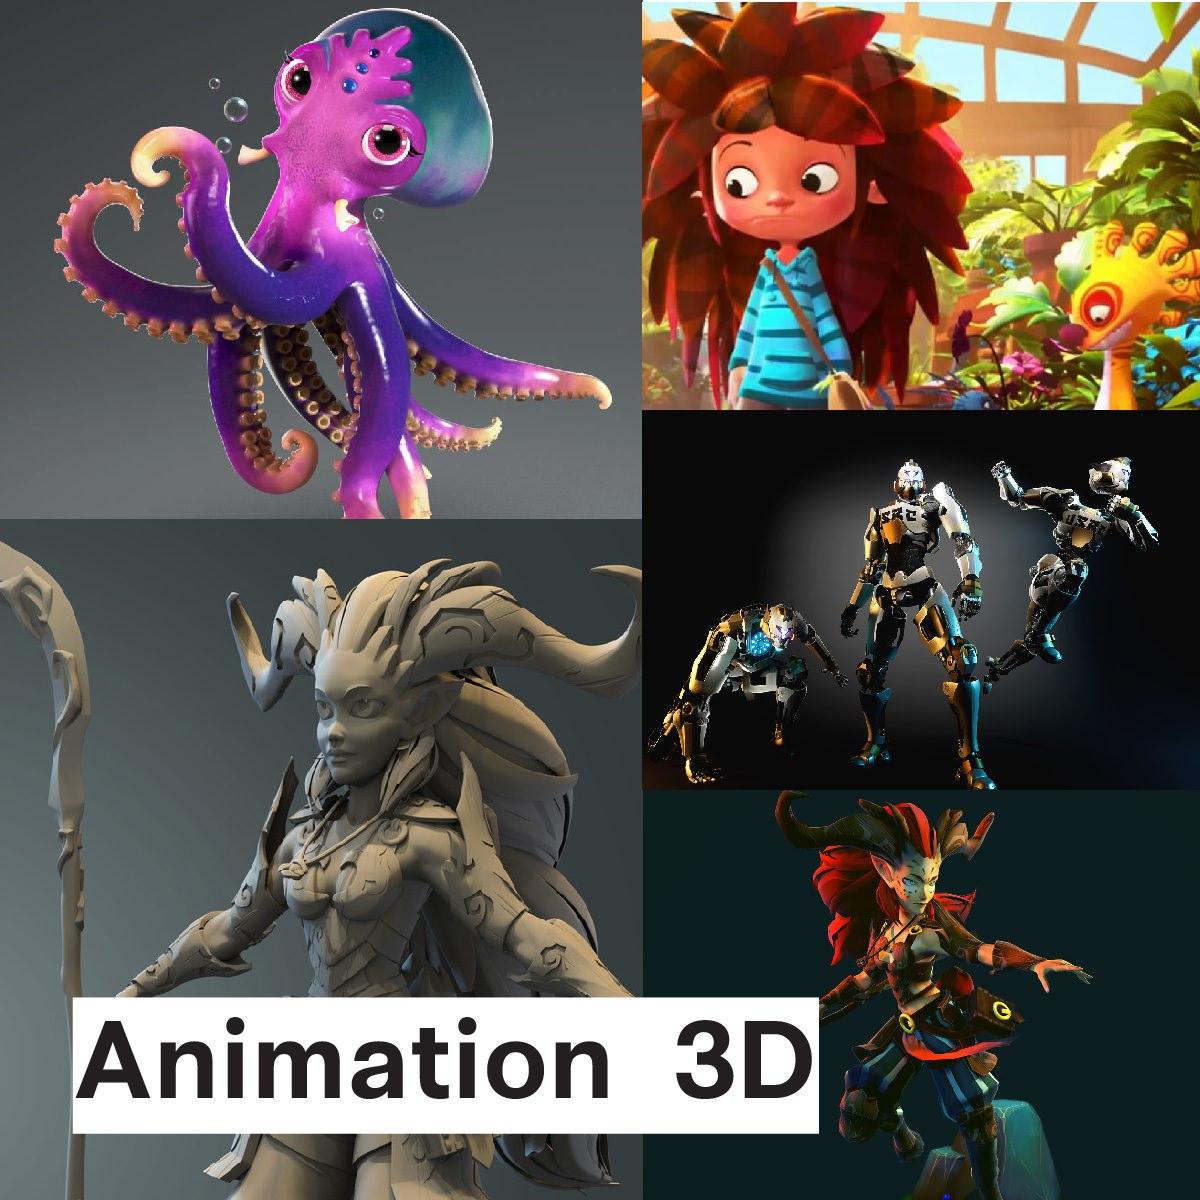 Bellecour Ecole - Animation